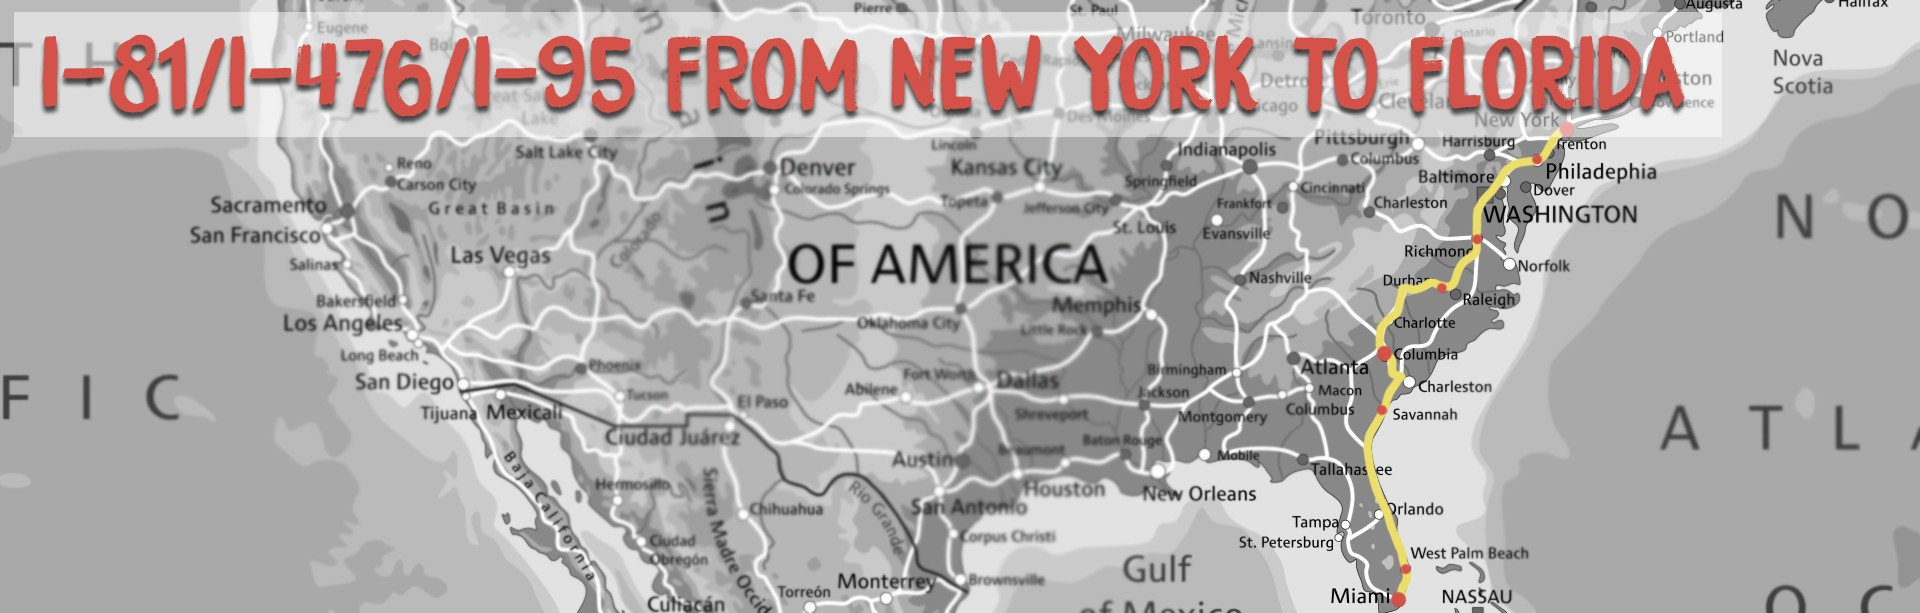 new york to florida